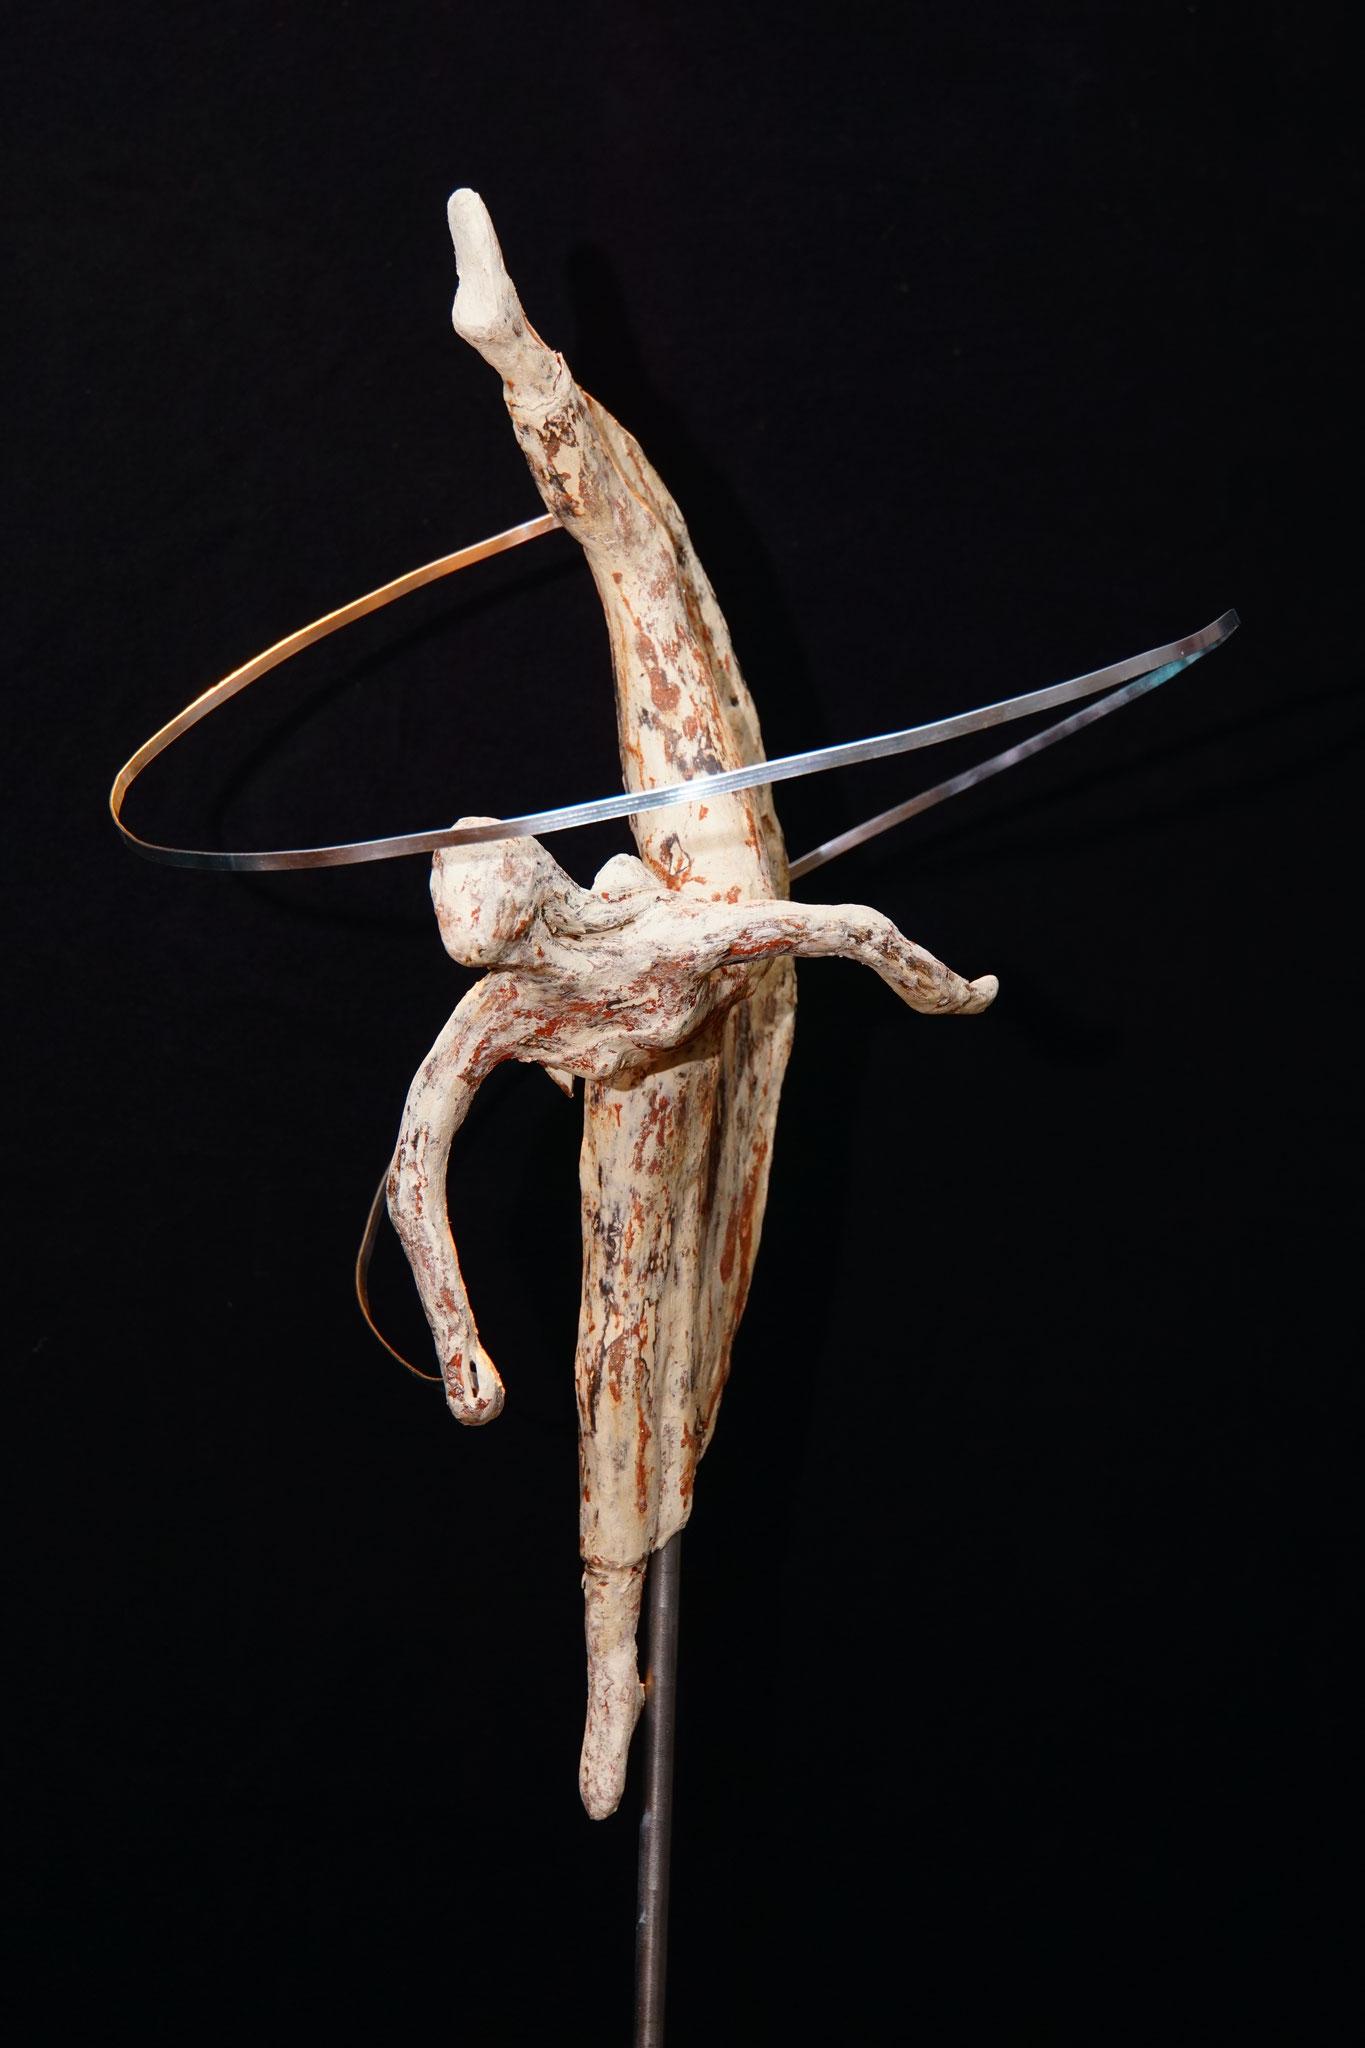 Ballerina ca. 50x 40 cm